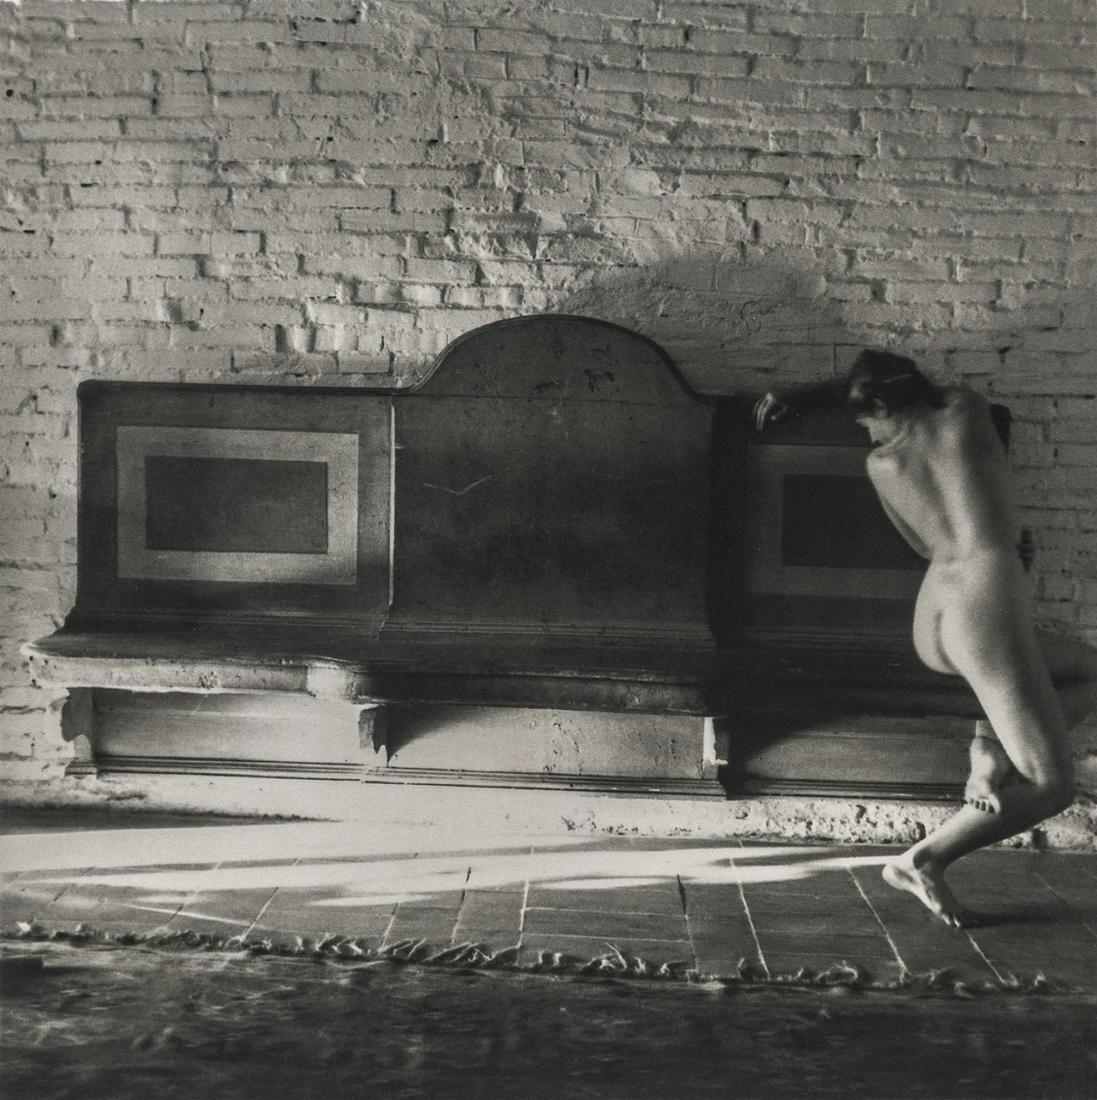 Francesca Woodman, Untitled, Antella, 1977-78